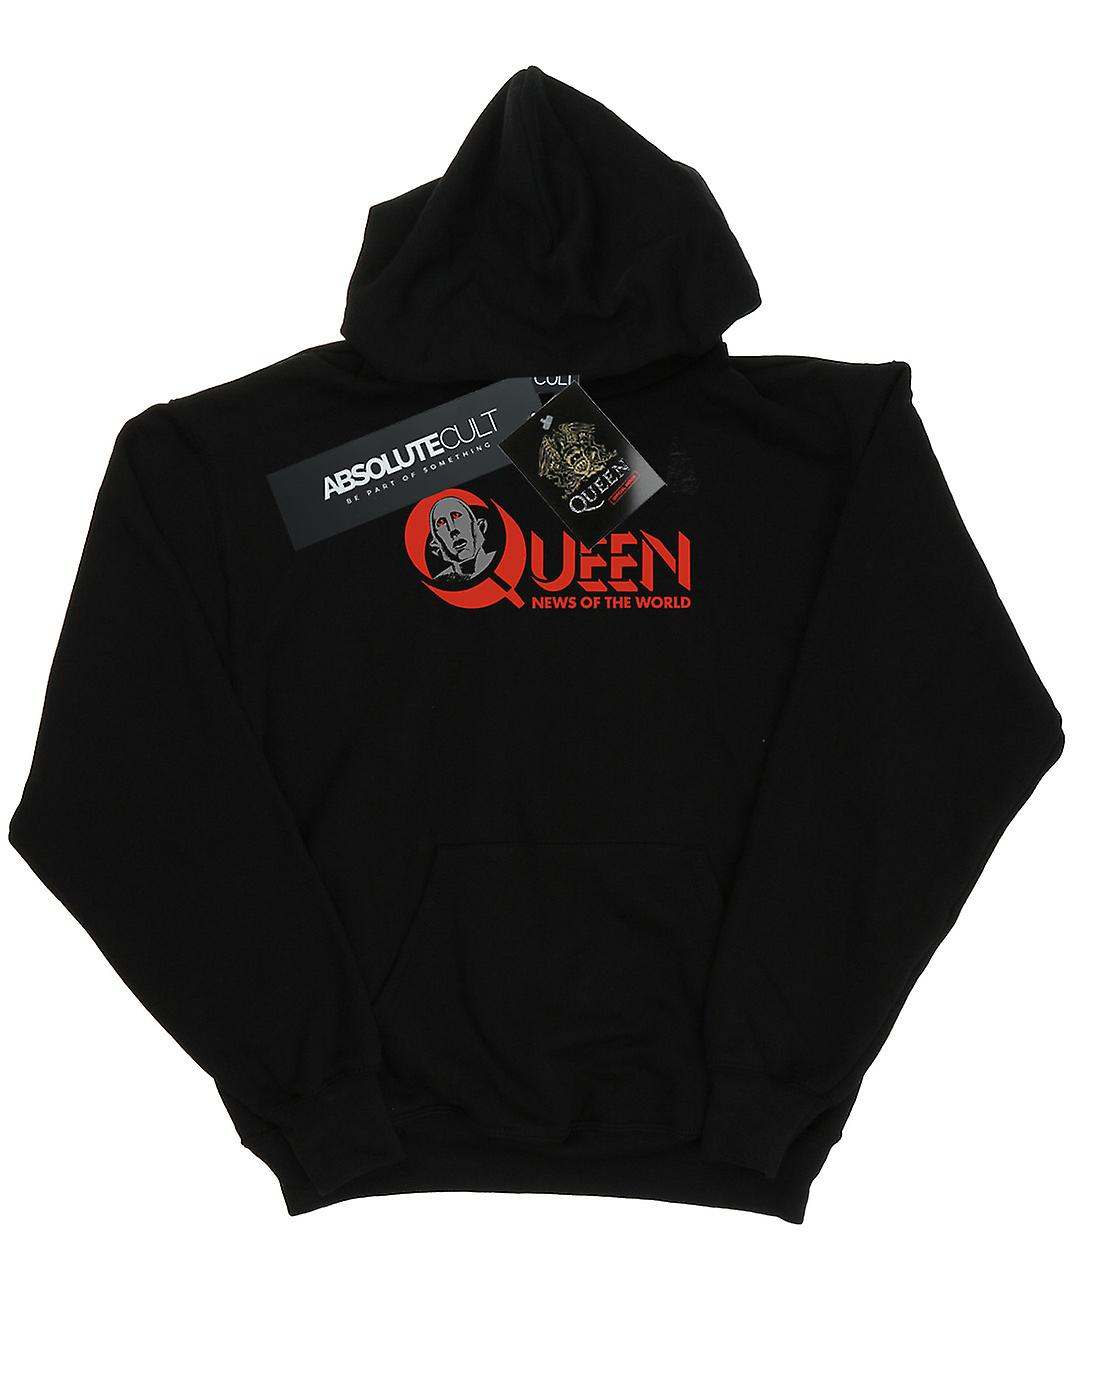 Queen Women's News Of The World Logo Hoodie